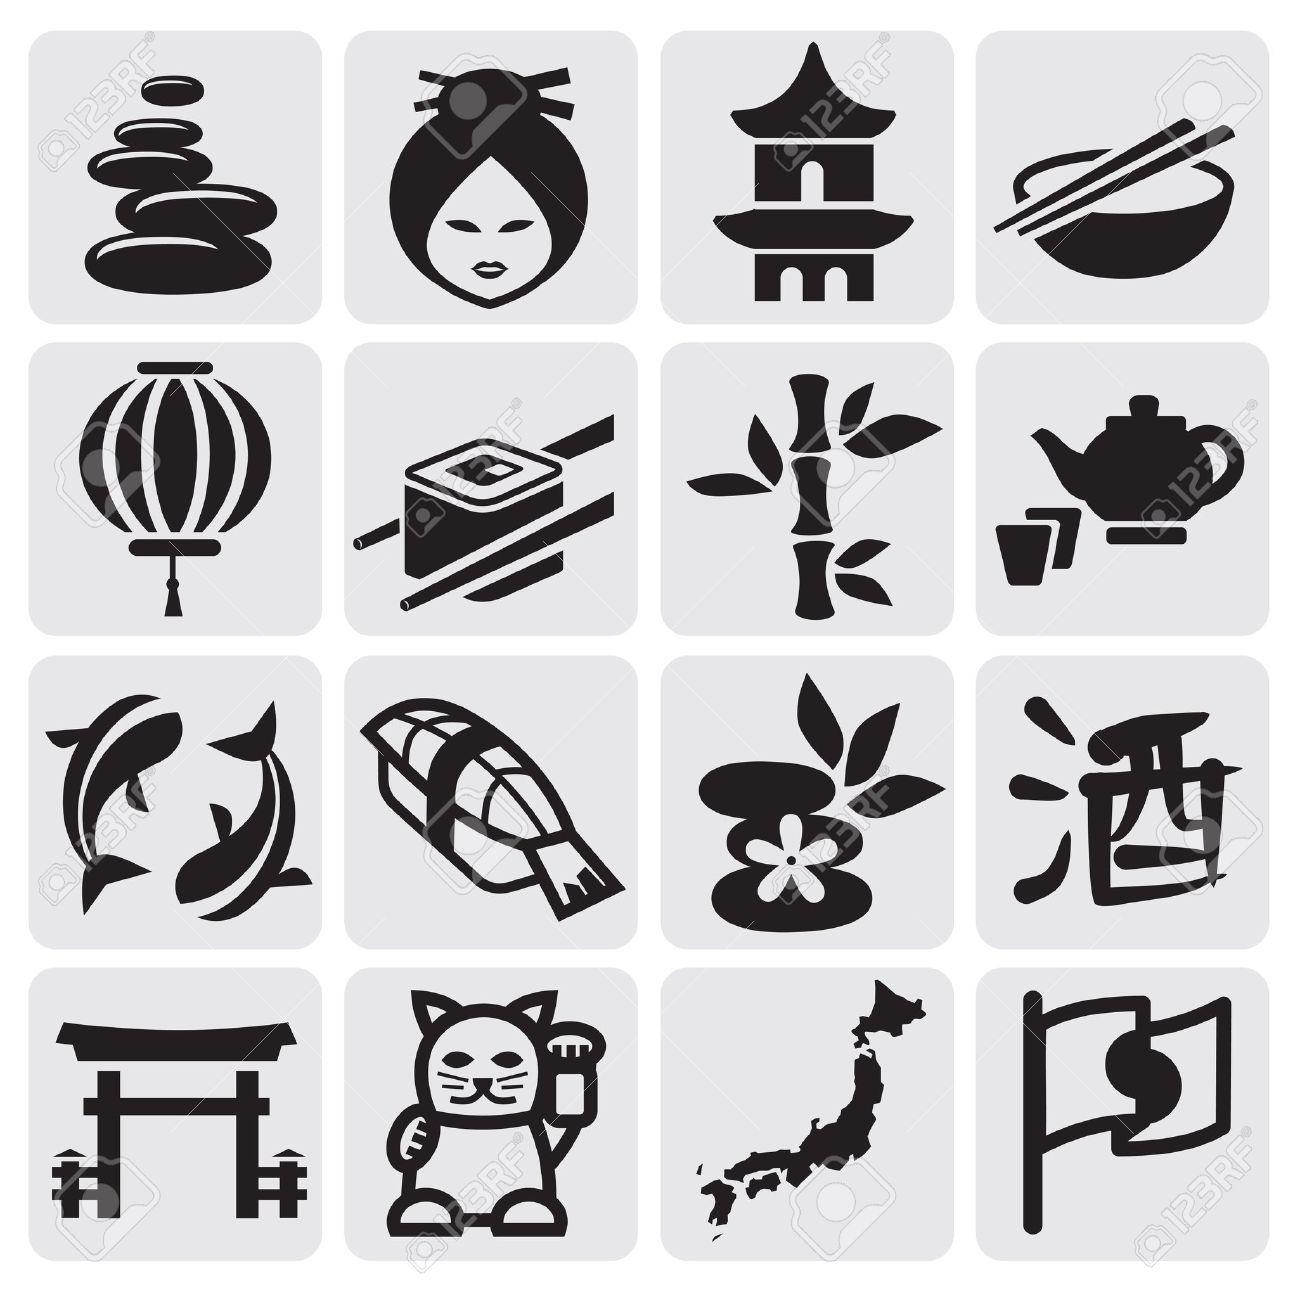 imágenes japonesas